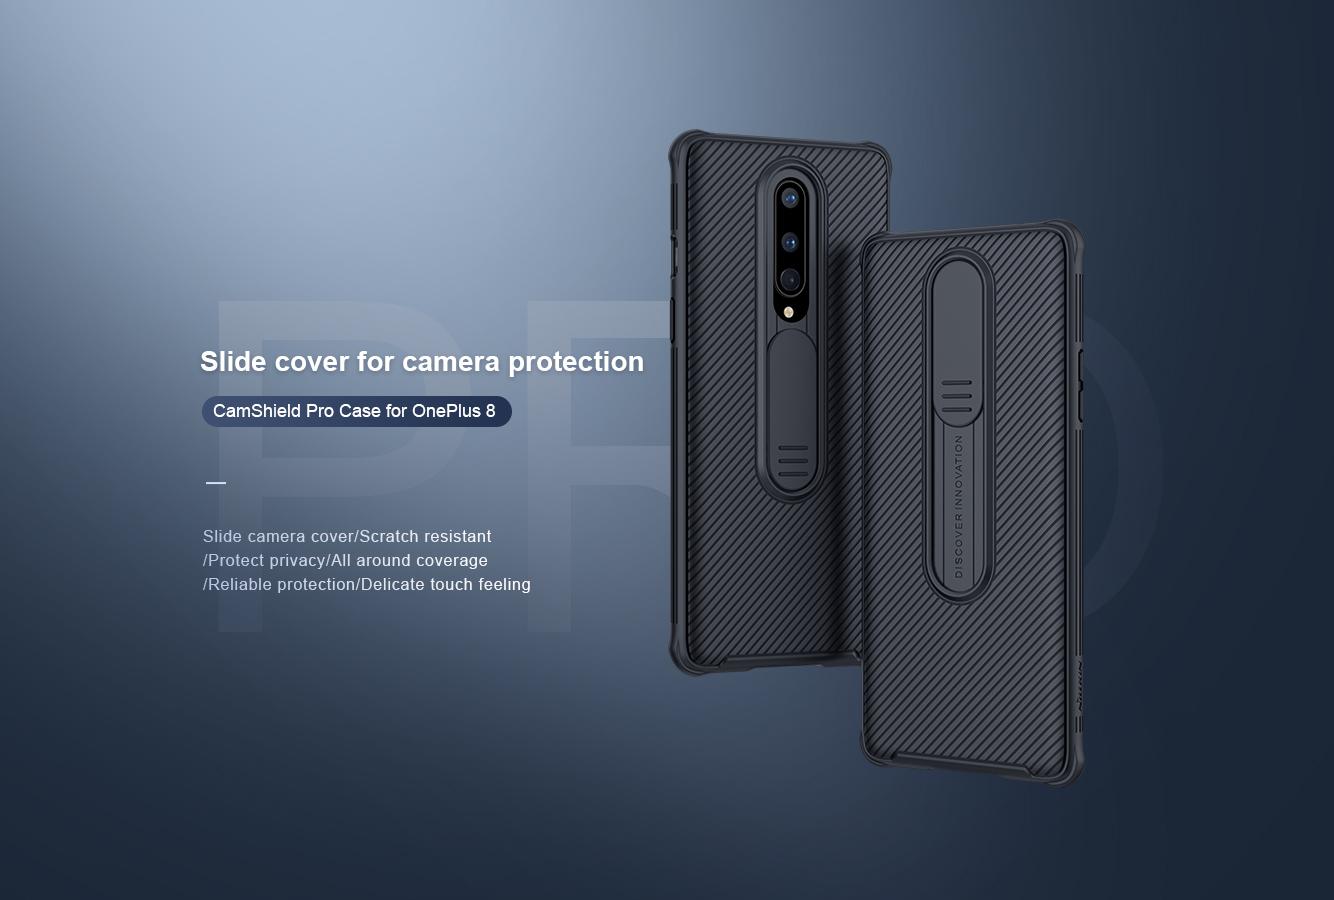 OnePlus_8_CamShield_Pro_Case-01.jpg